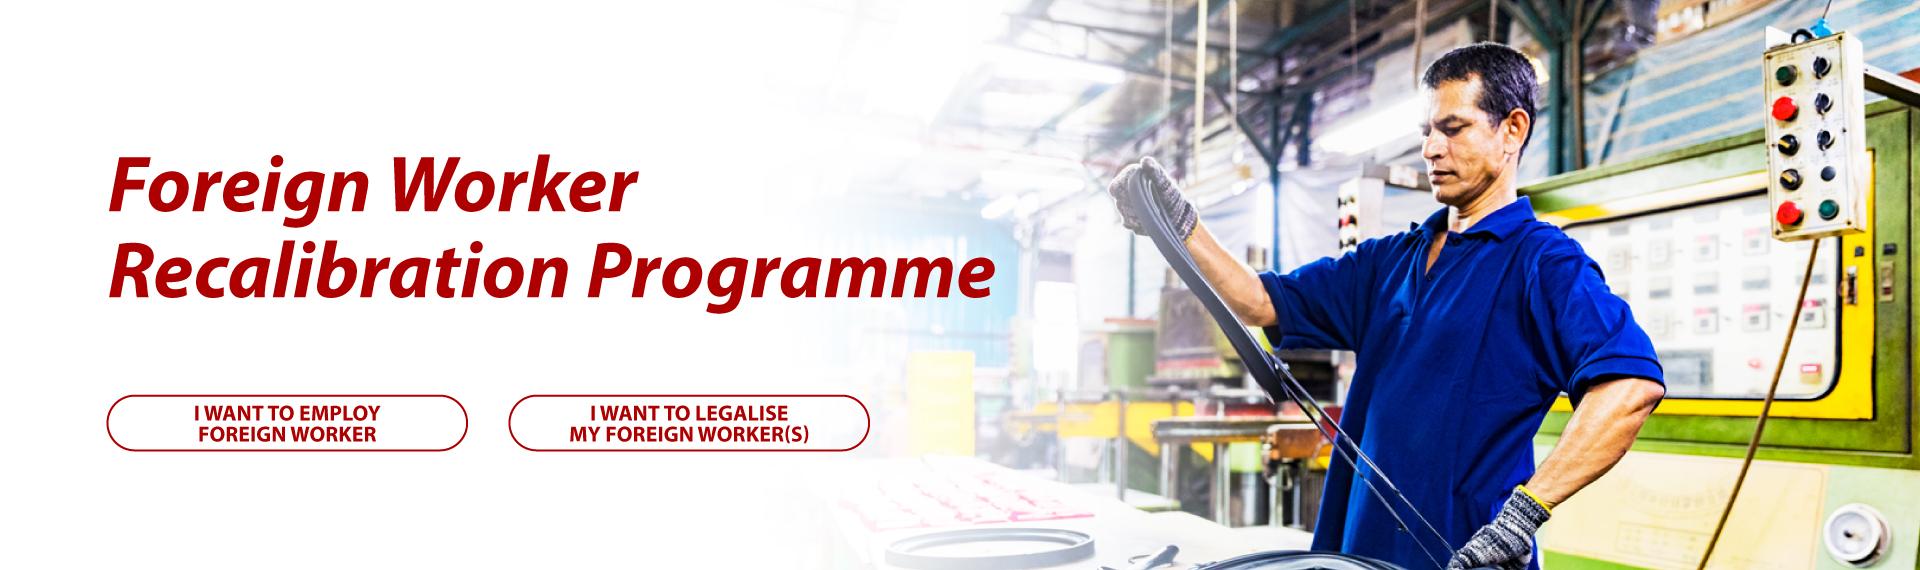 Foreign Worker Re-employment Programme